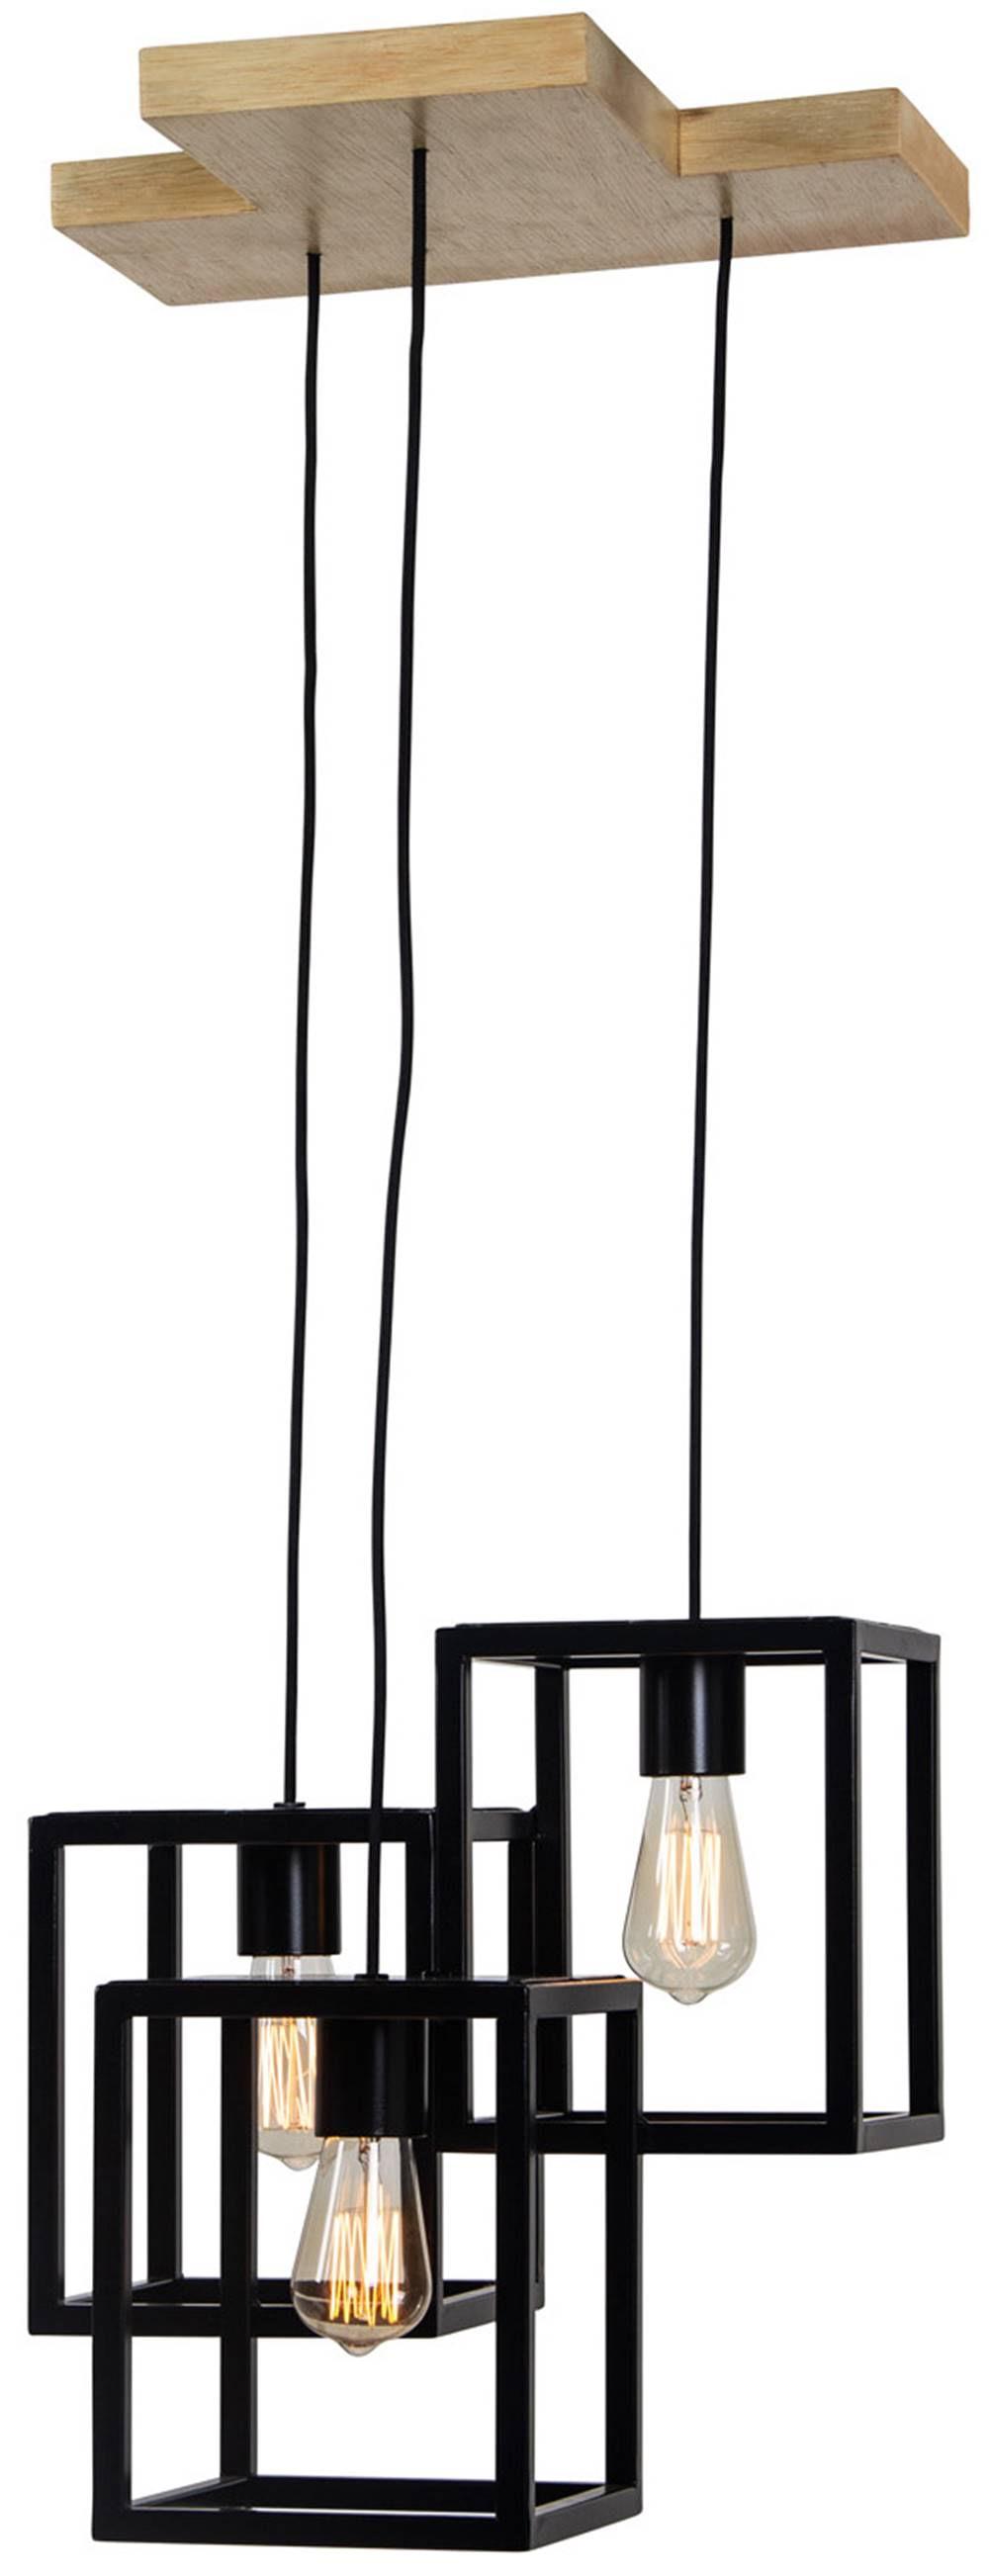 Luminaria Pendente Club Estrutura de Tubo de Ferro cor Preto 43cm (LARG) - 54137